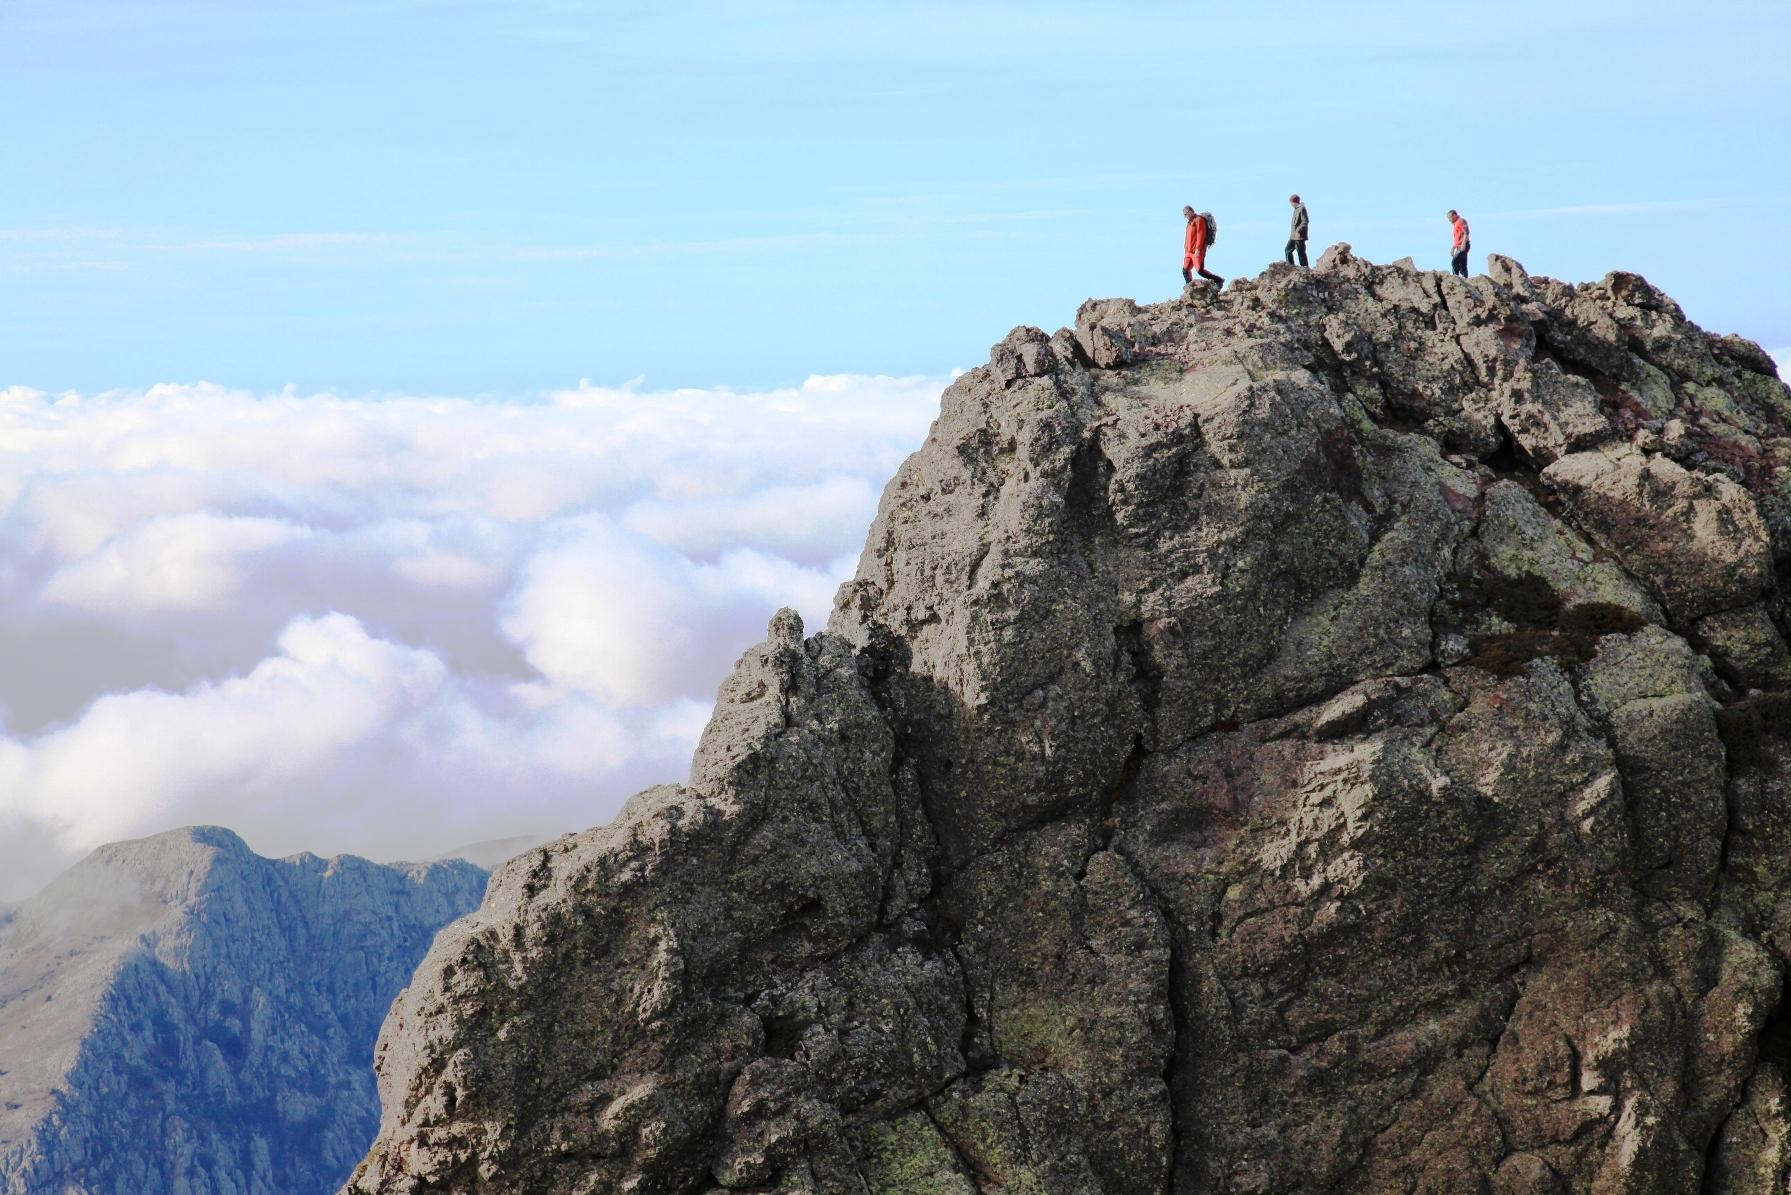 Rando Alpine en Corse -Au sommet de la Punta Silvastriccia